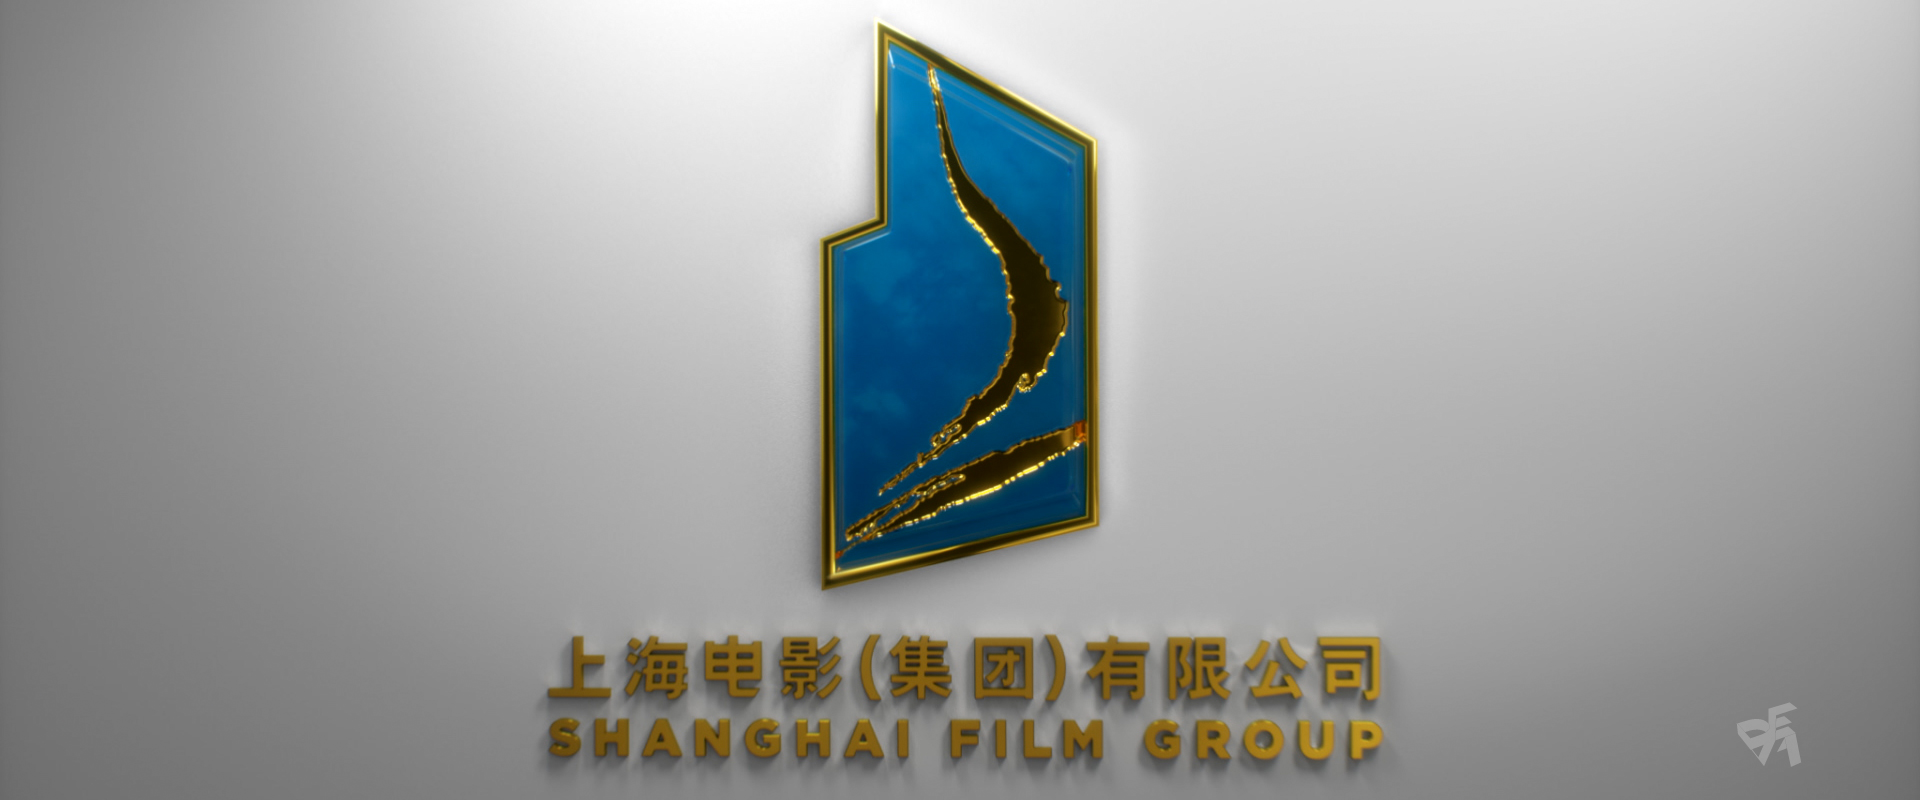 ShanghaiFilmGroup_STUDIOLOGO_06.jpg